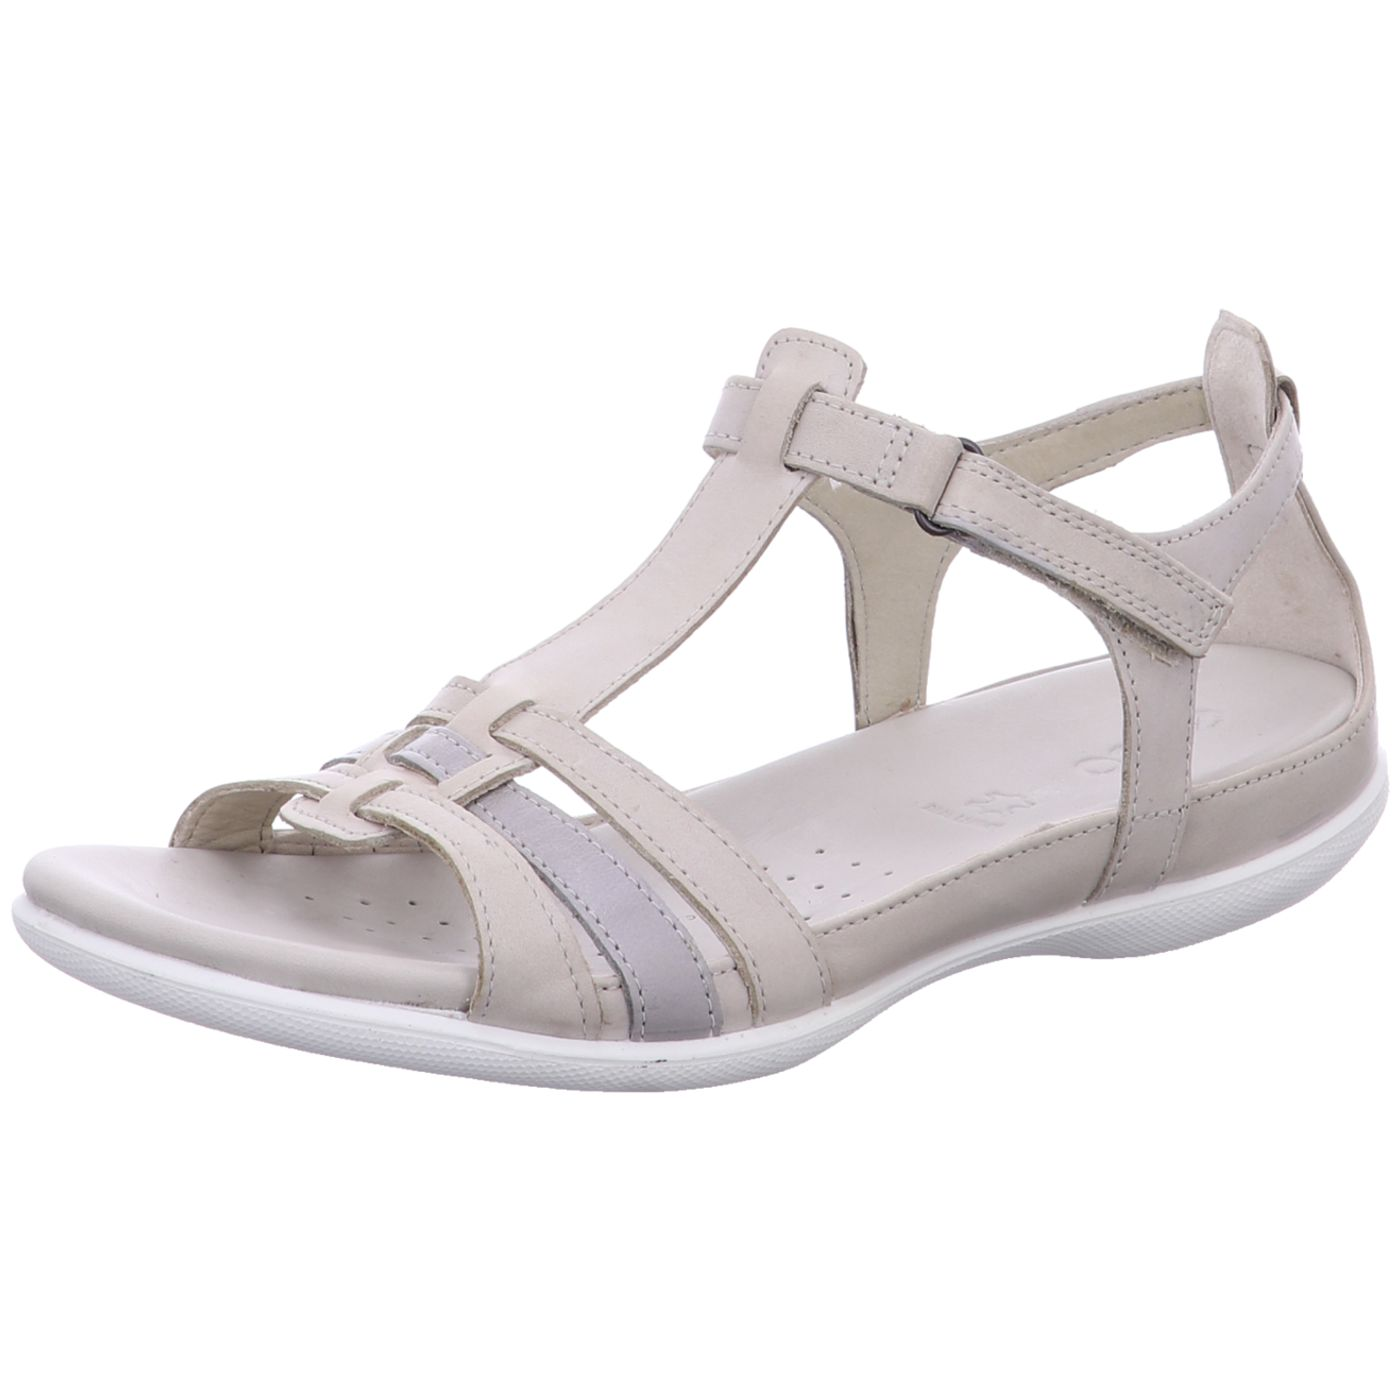 d7bd6f74191973 Ecco Schuhe Damen » Sneaker